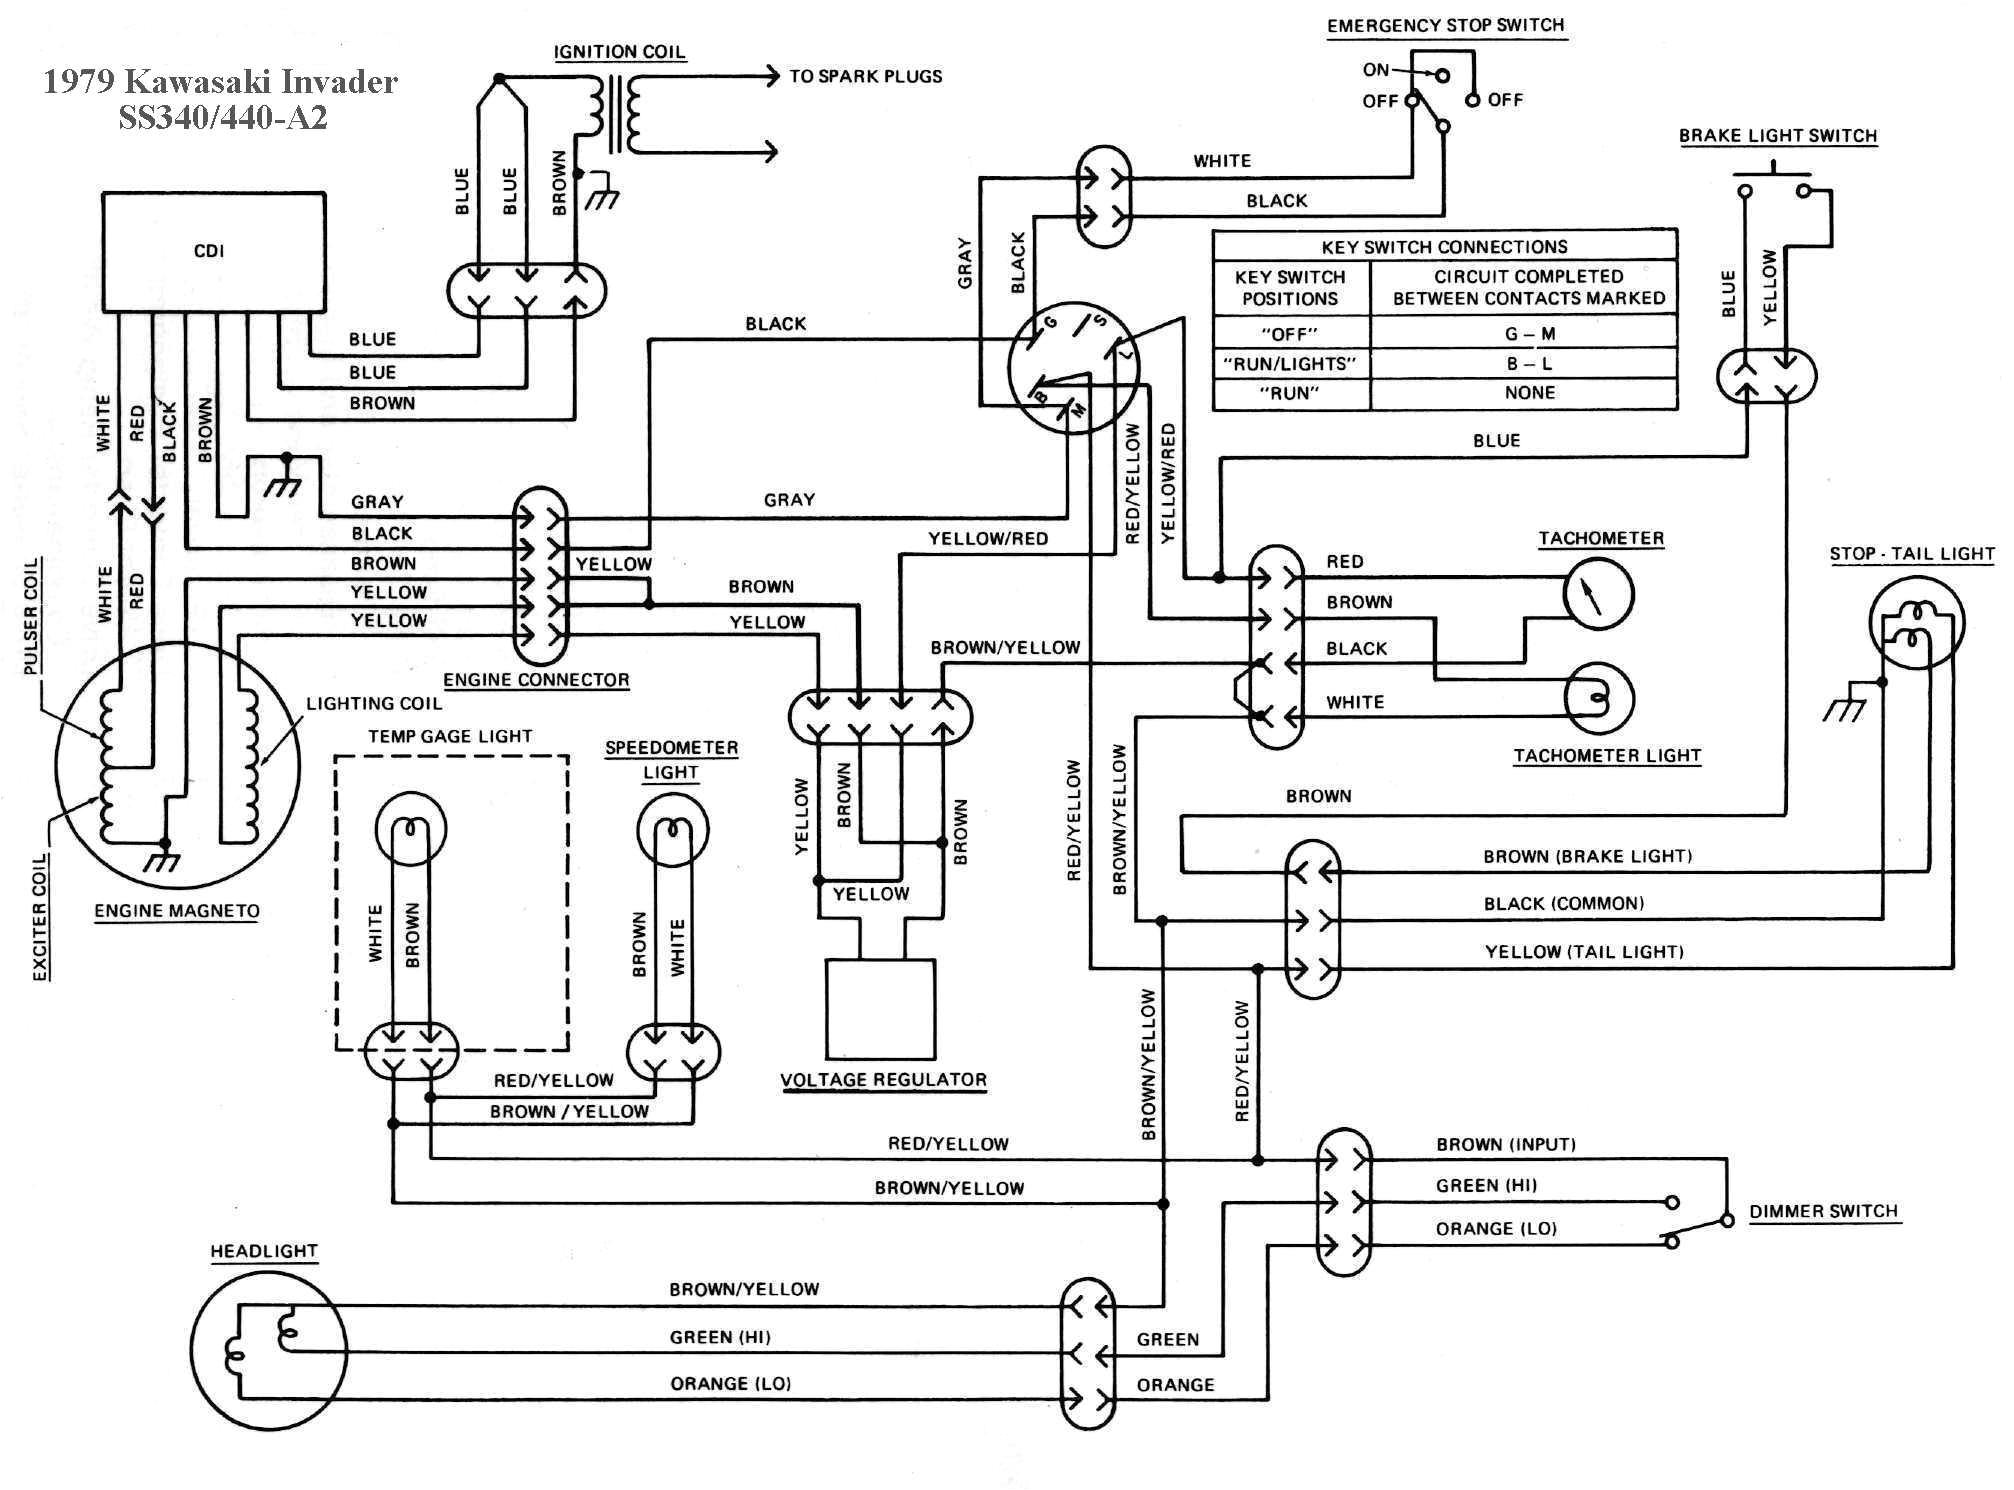 Kawasaki Mule 610 Ignition Switch Wiring Diagram Fc 0050 Kawasaki Mule Wiring Diagram Furthermore Kawasaki